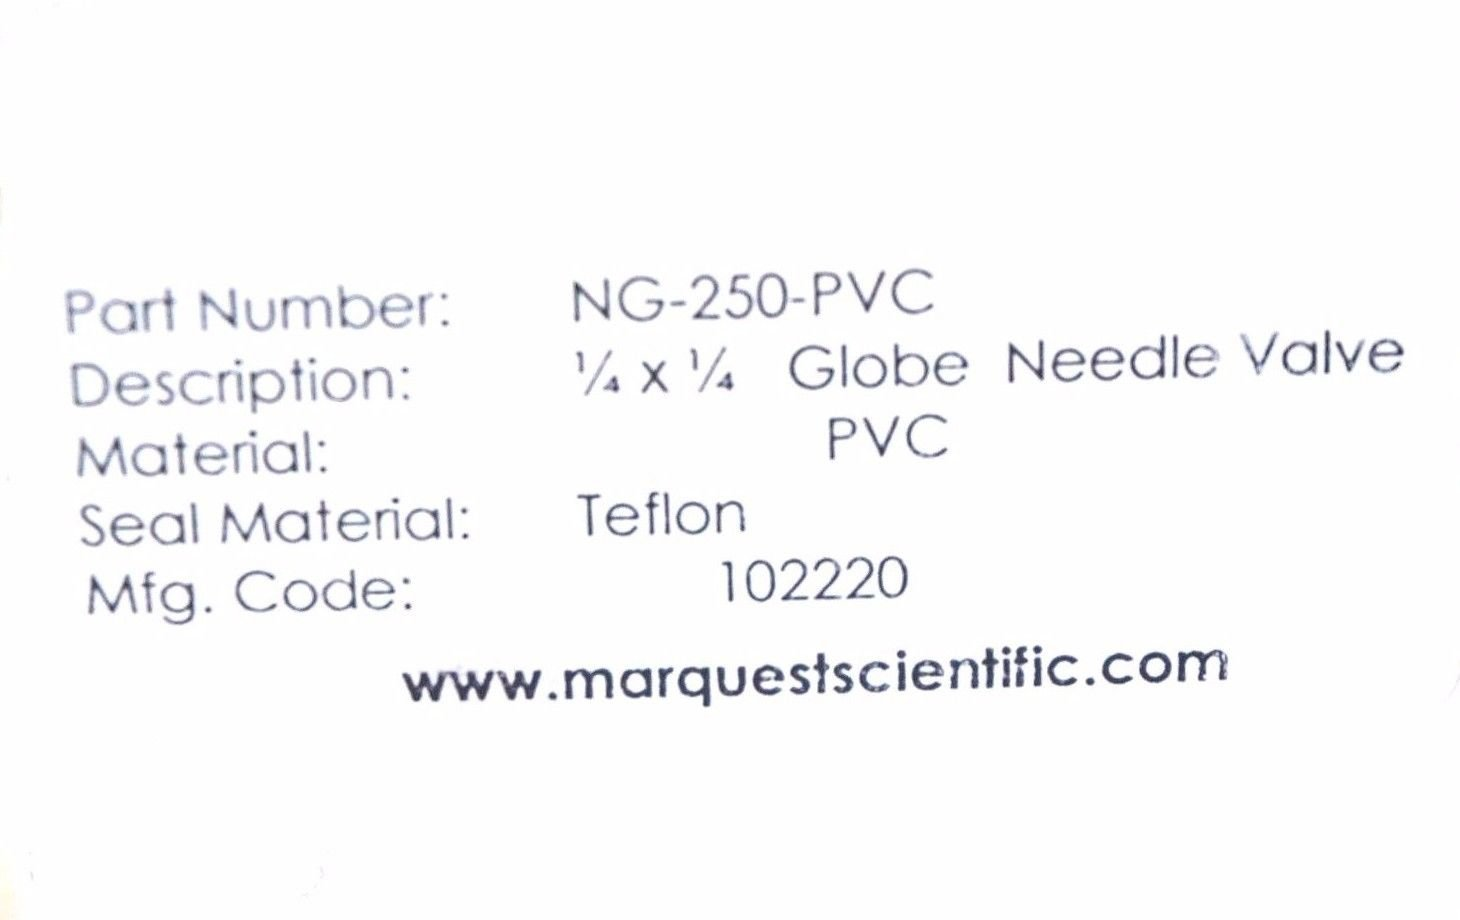 NEW MARQUEST SCIENTIFIC NG-250-PVC NEEDLE VALVE NG250PVC